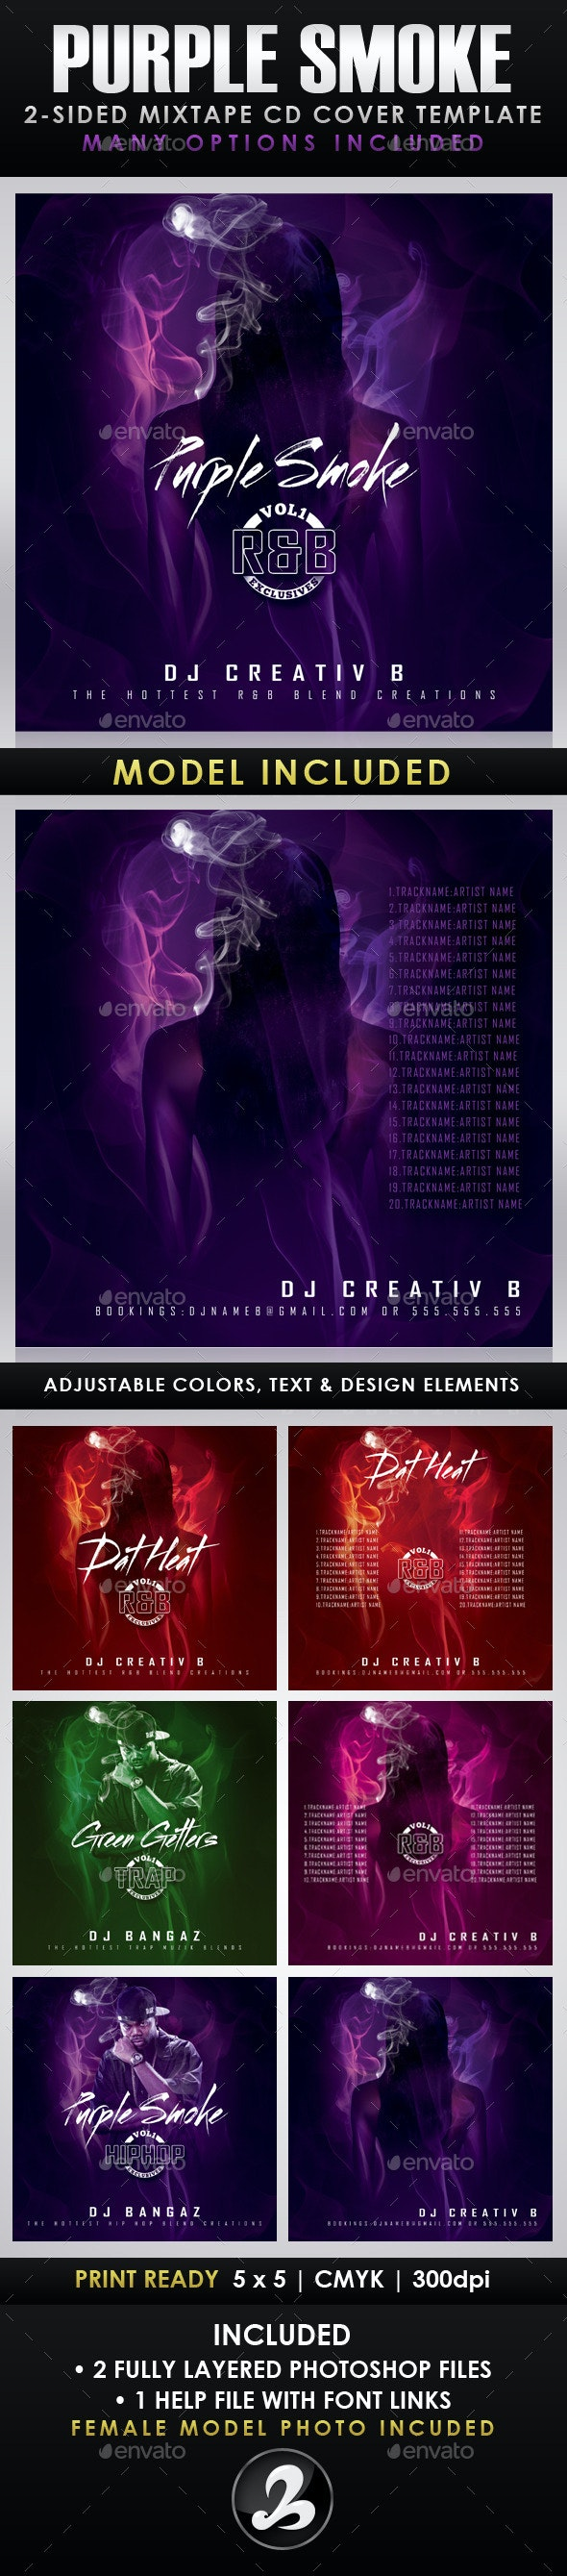 Purple Smoke Mixtape CD Cover Templates - CD & DVD Artwork Print Templates